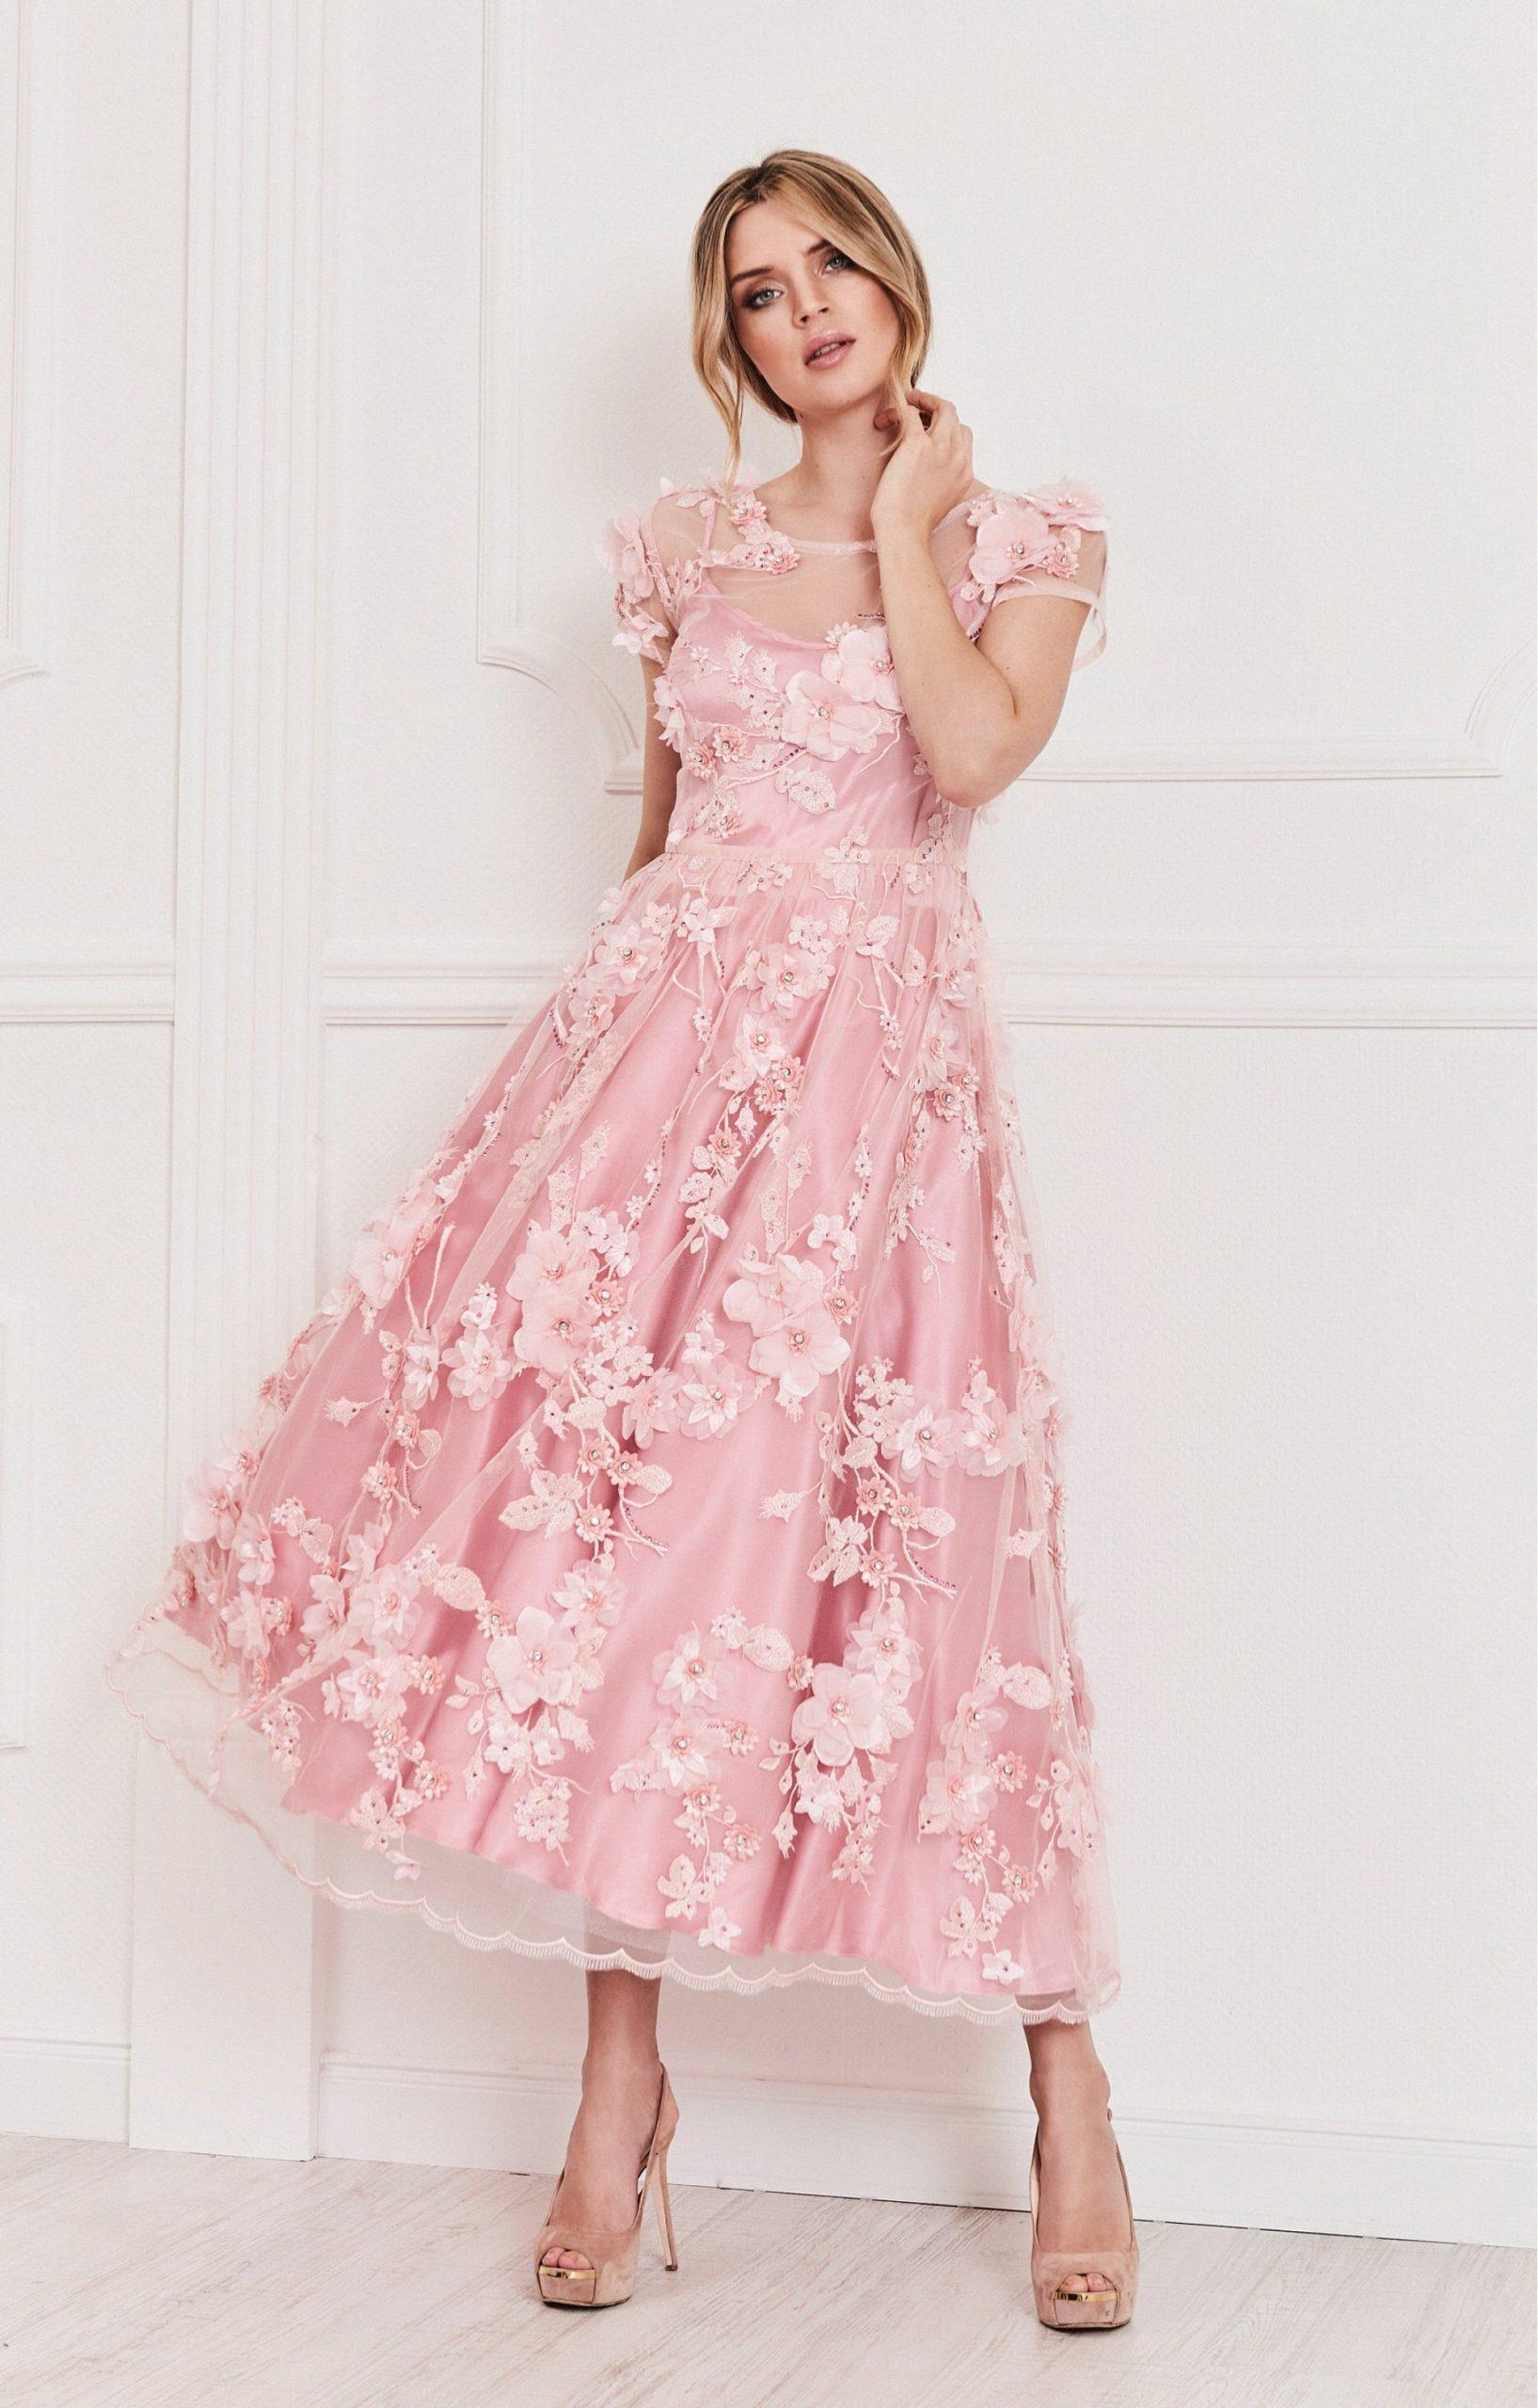 Großartig Abend Kleid Midi Ärmel13 Elegant Abend Kleid Midi Design